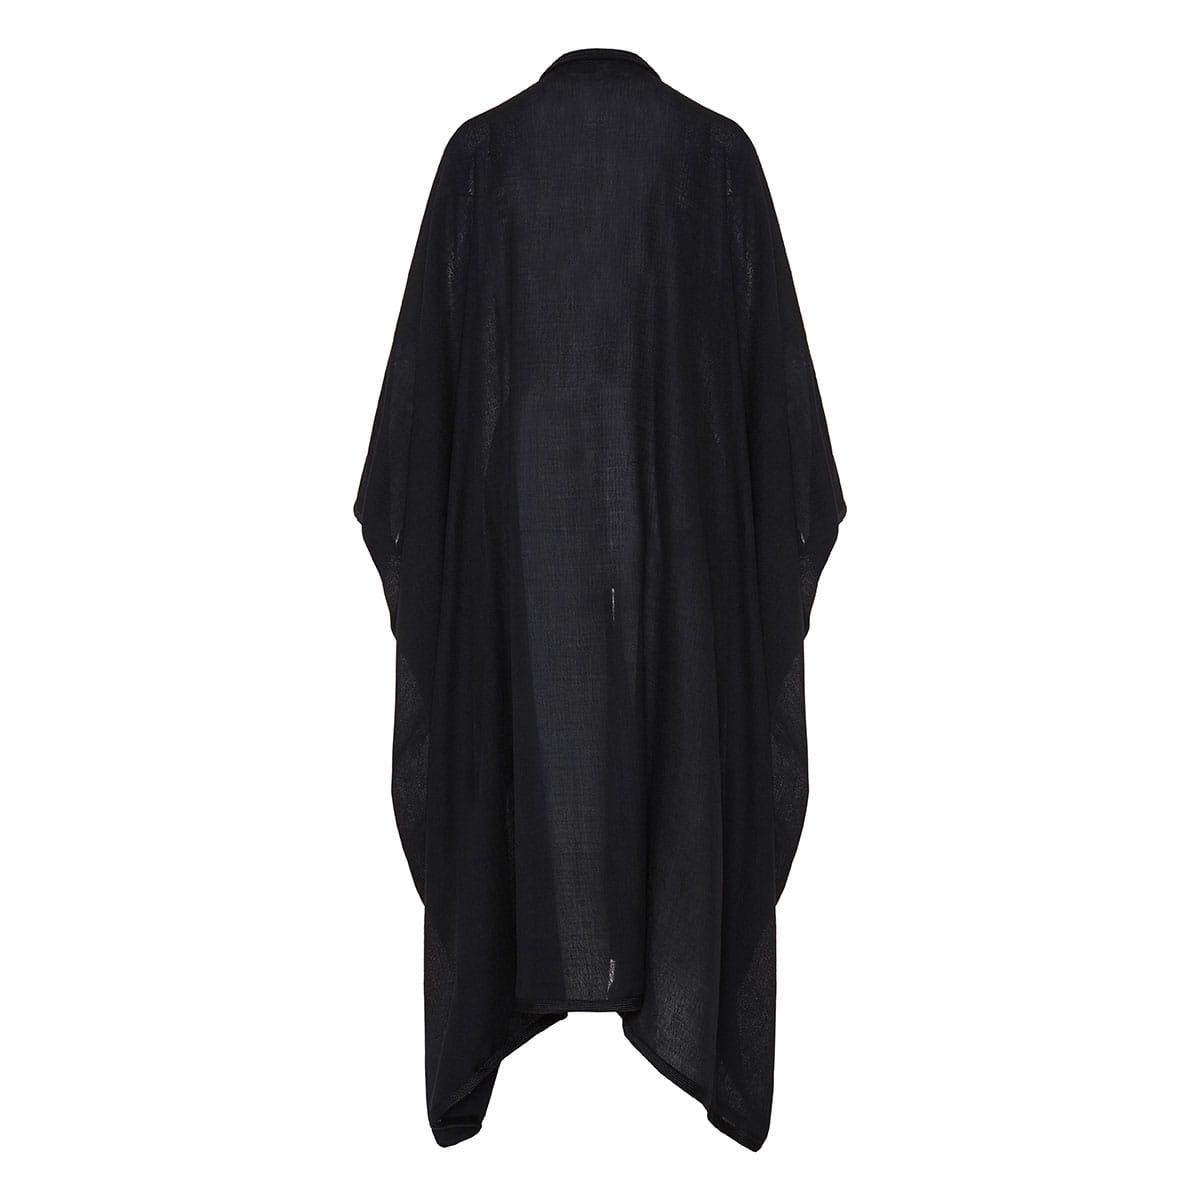 Tasseled long wool shawl